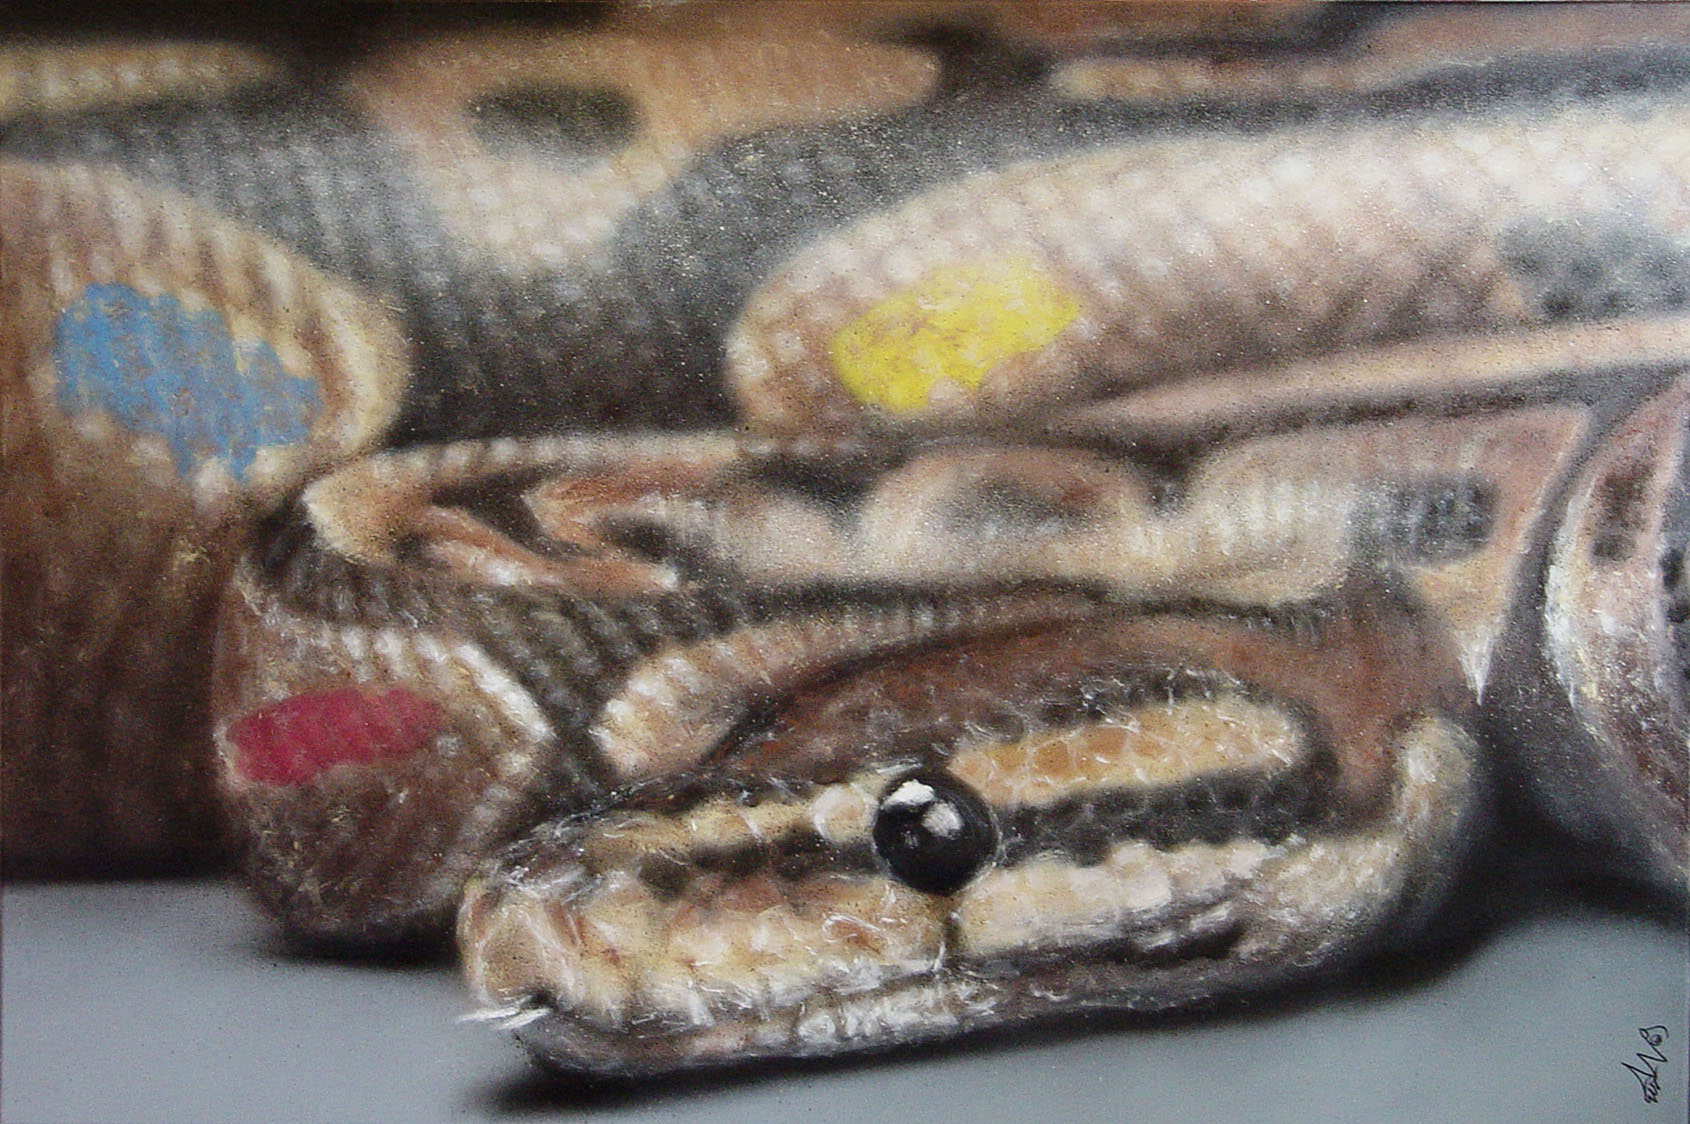 SATH snake